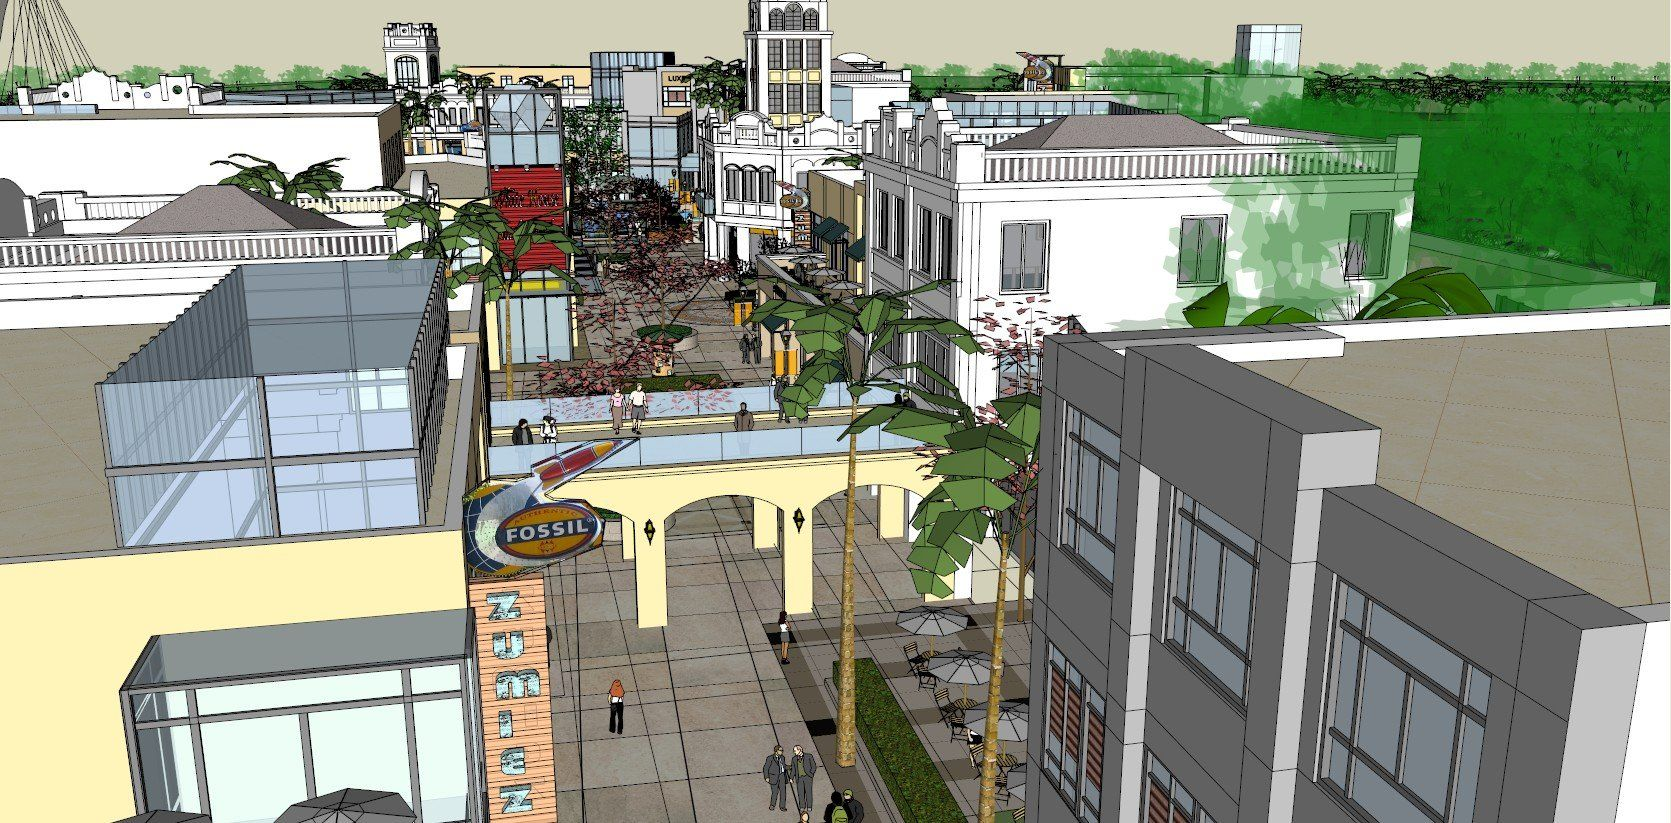 ☆Sketchup 3D Models-Large Scale City Sketchup Models | ☆Sketchup